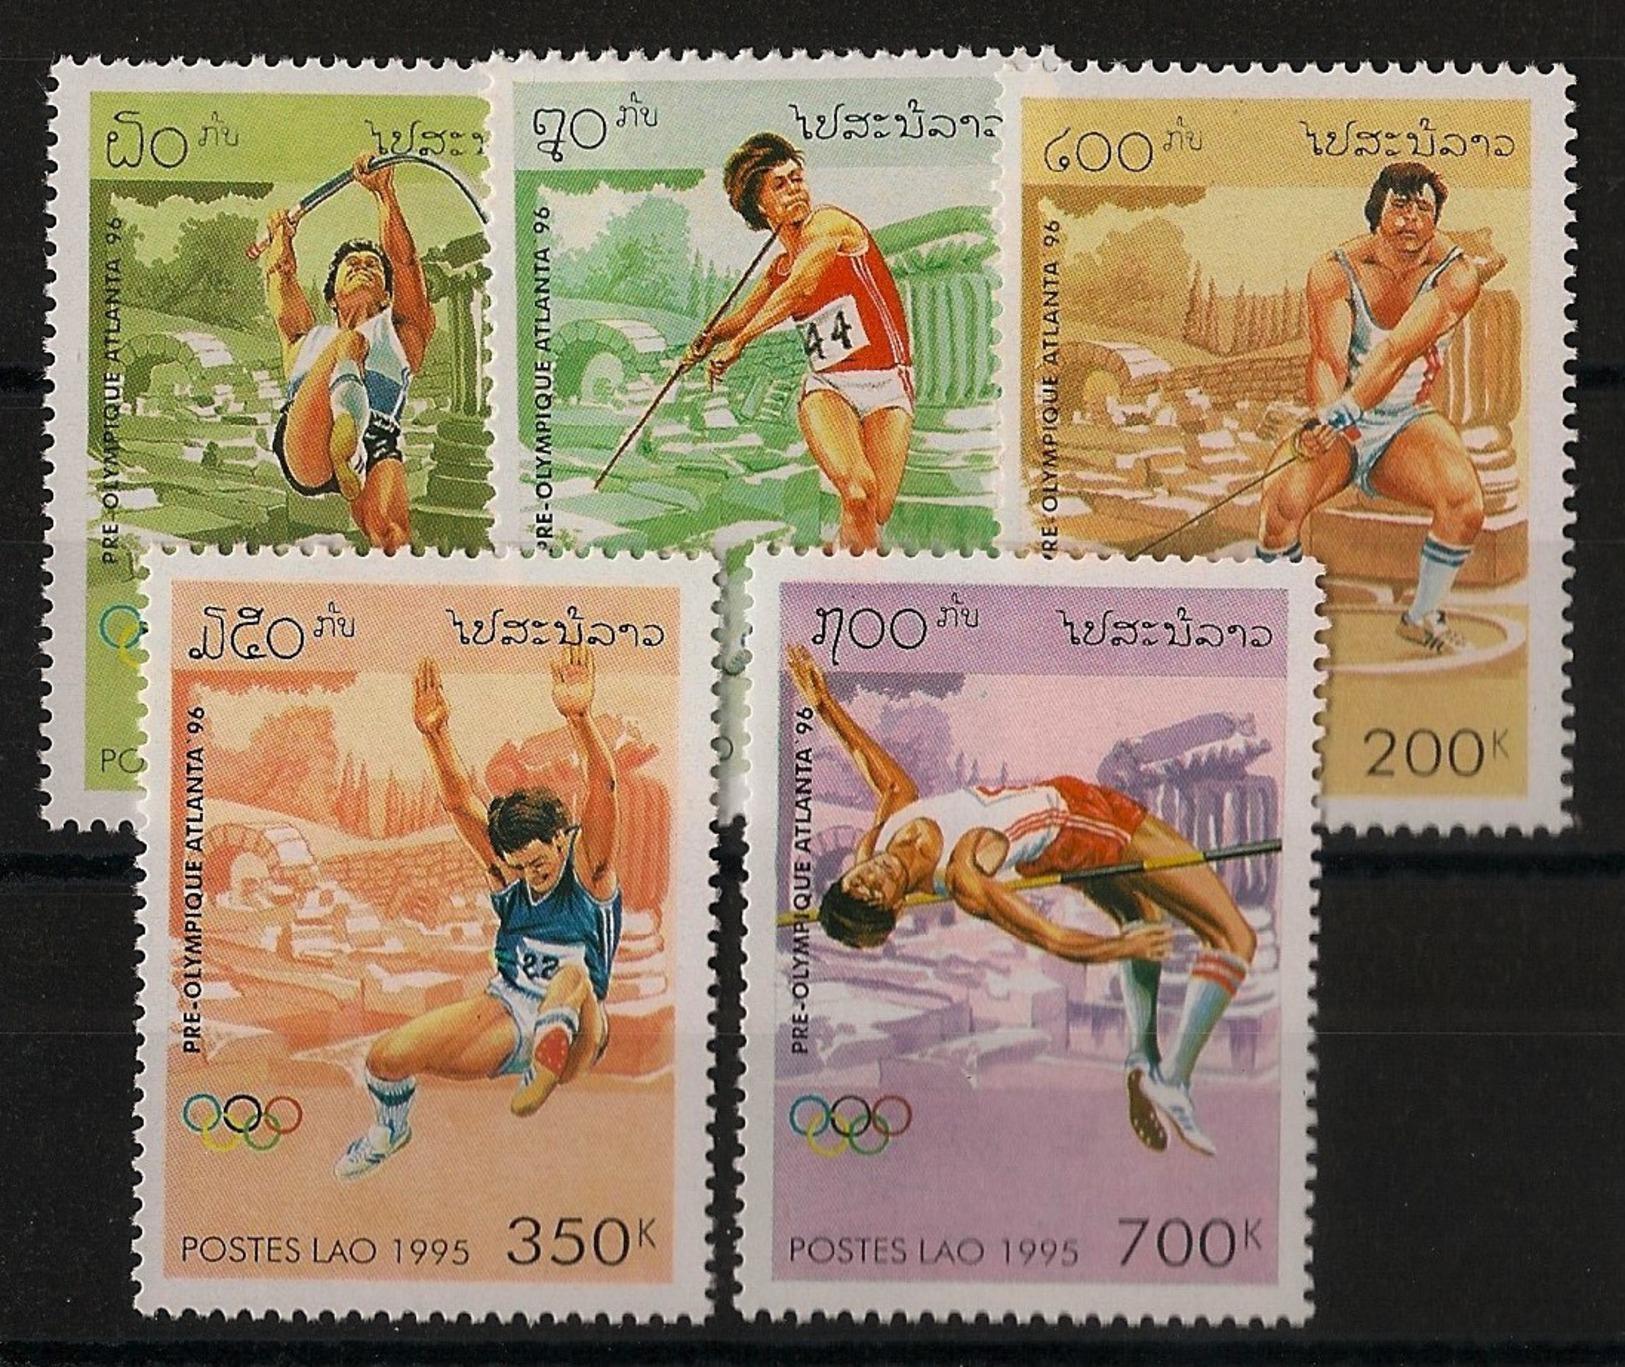 Laos N°Yv. 1173 à 1176 - Complet - Neuf Luxe ** - MNH - Postfrisch - Cote 6 EUR - Ete 1996: Atlanta